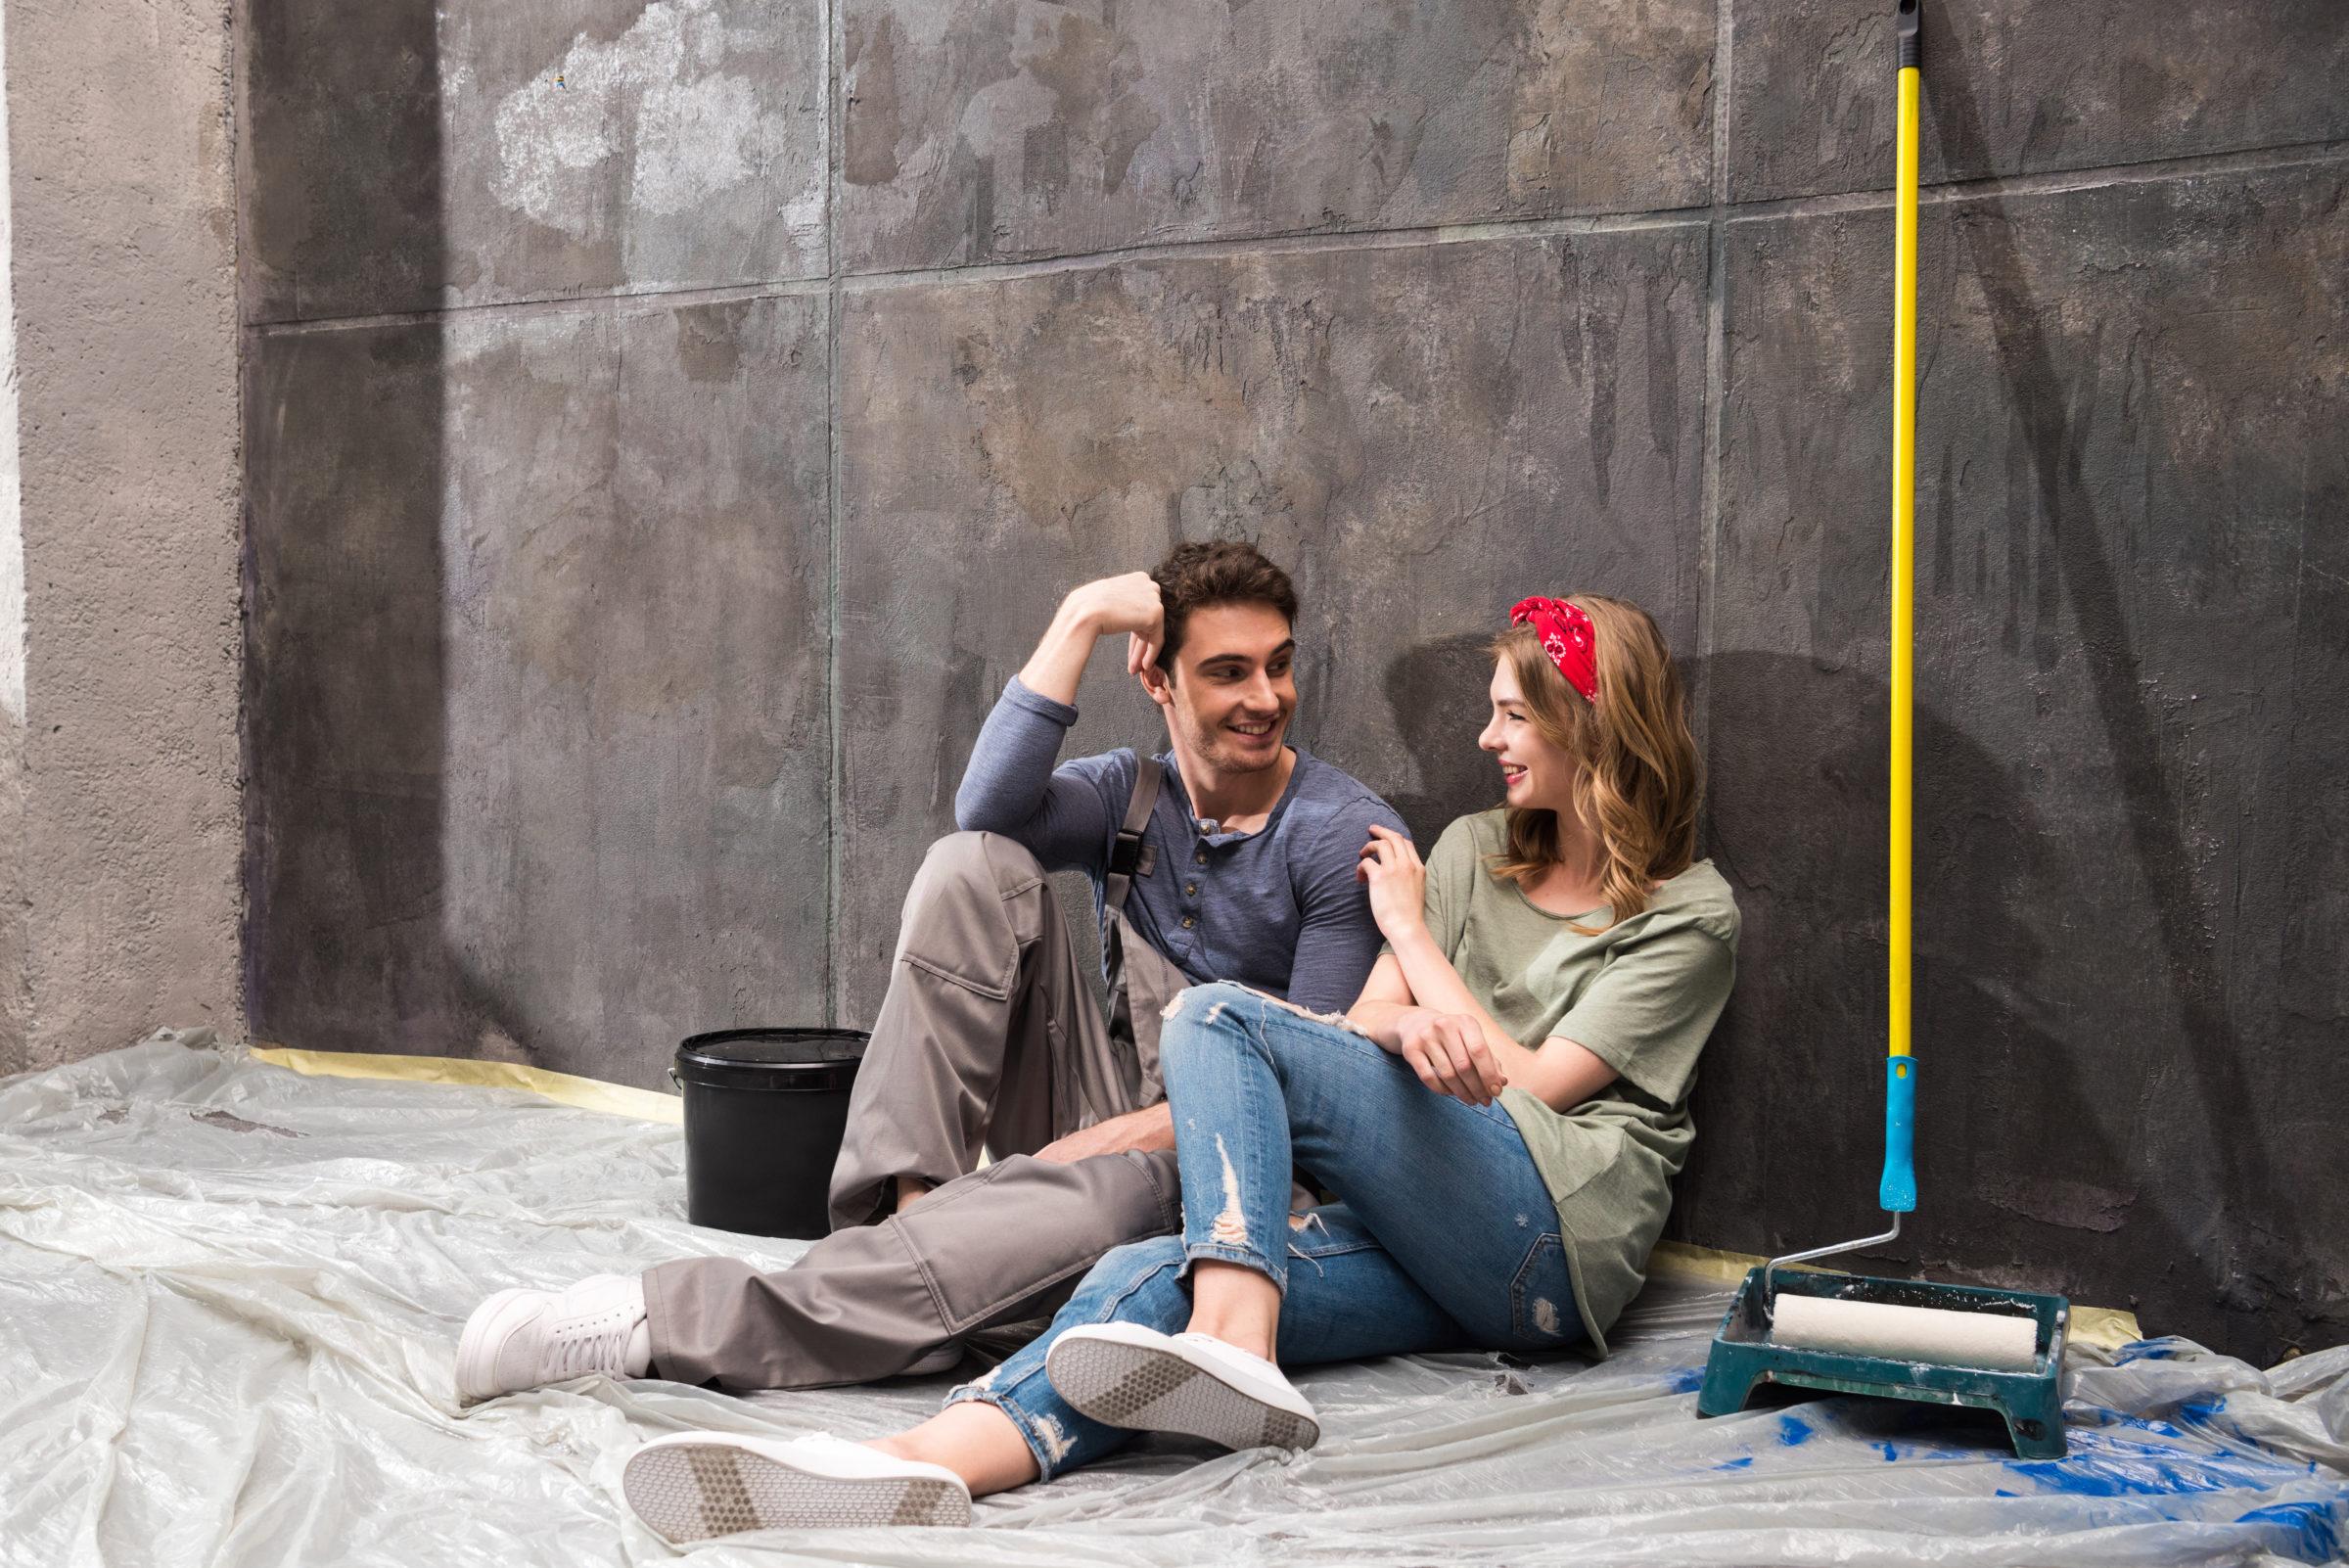 young professional couple sitting together on floo KU7C36K